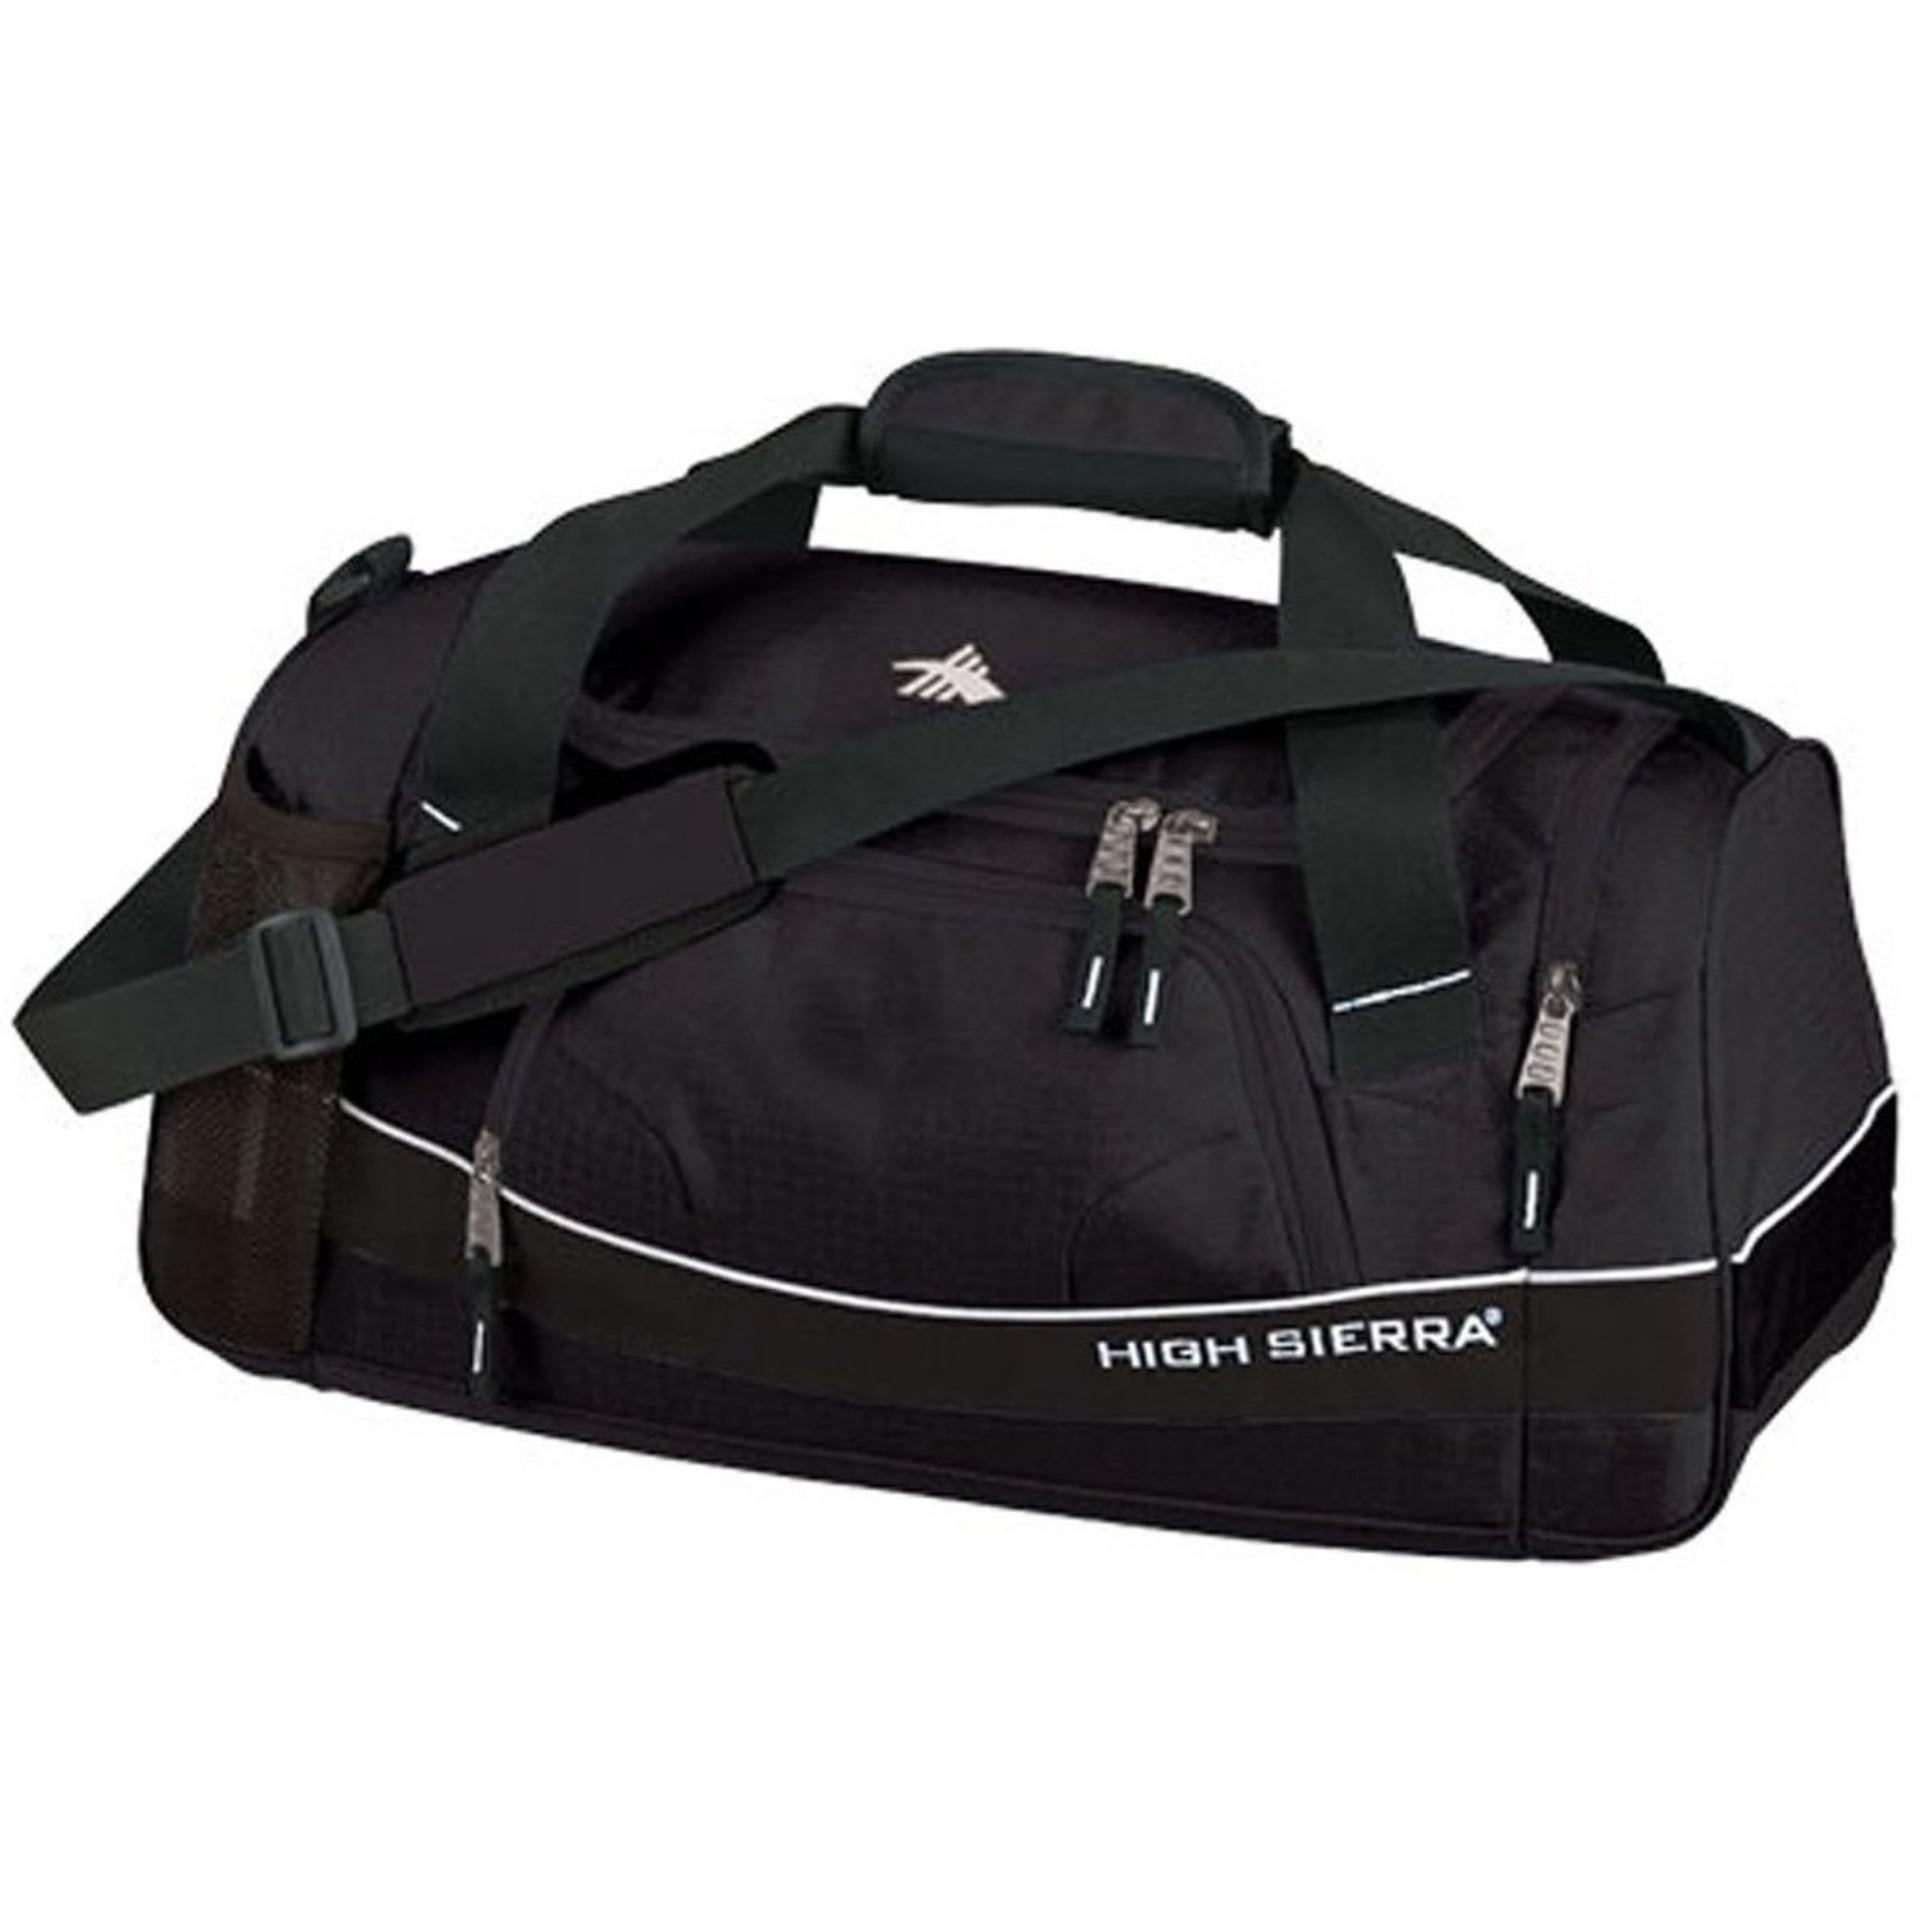 98c585bb5 High Sierra Philippines: High Sierra price list - High Sierra Luggage,  Backpack, Shoulder & Trolley Bag for sale | Lazada